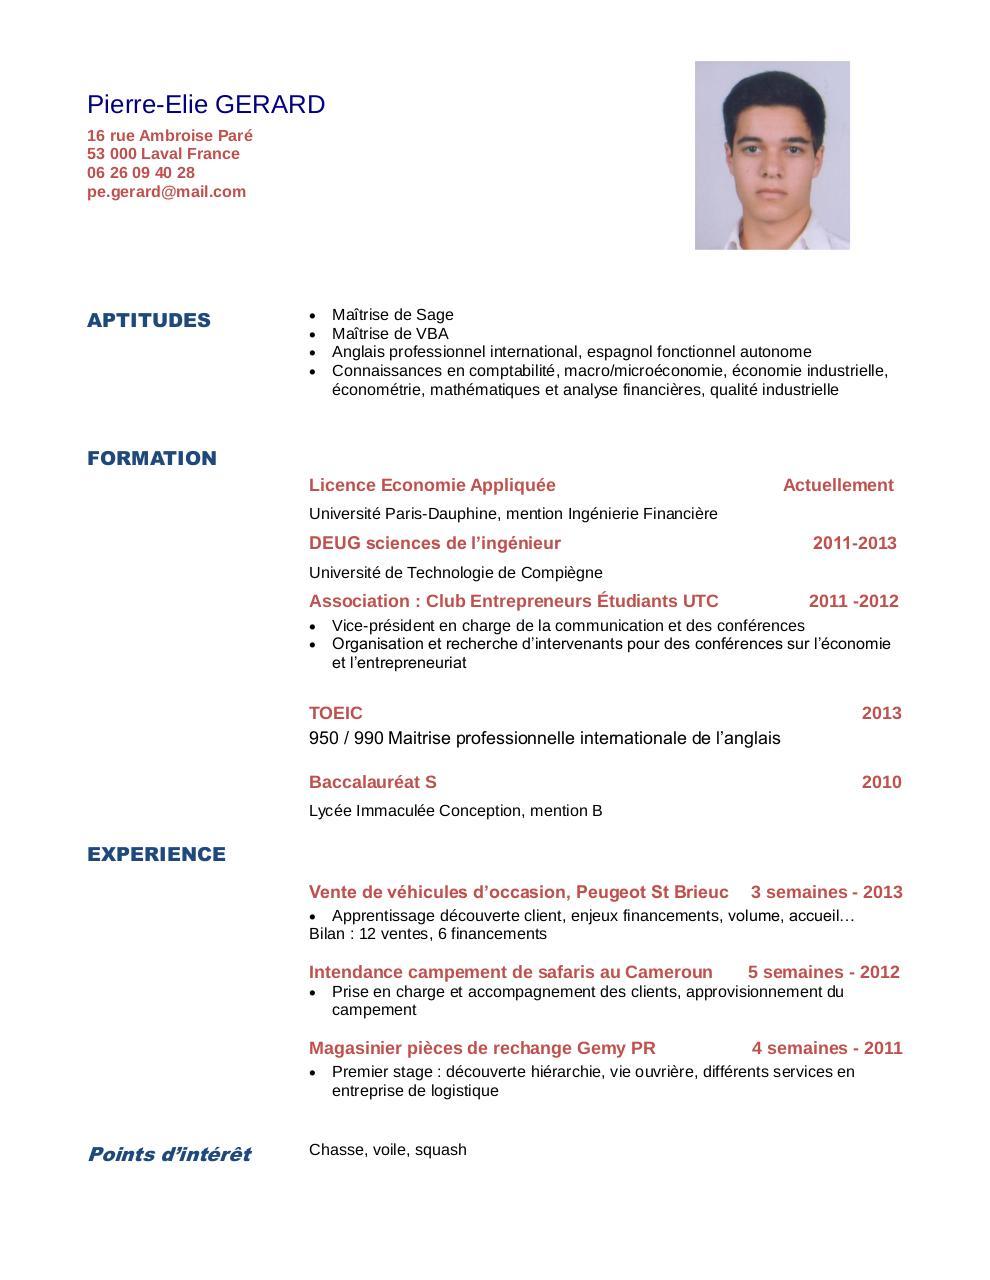 resume 4 par utilisateur - cv gerard pdf